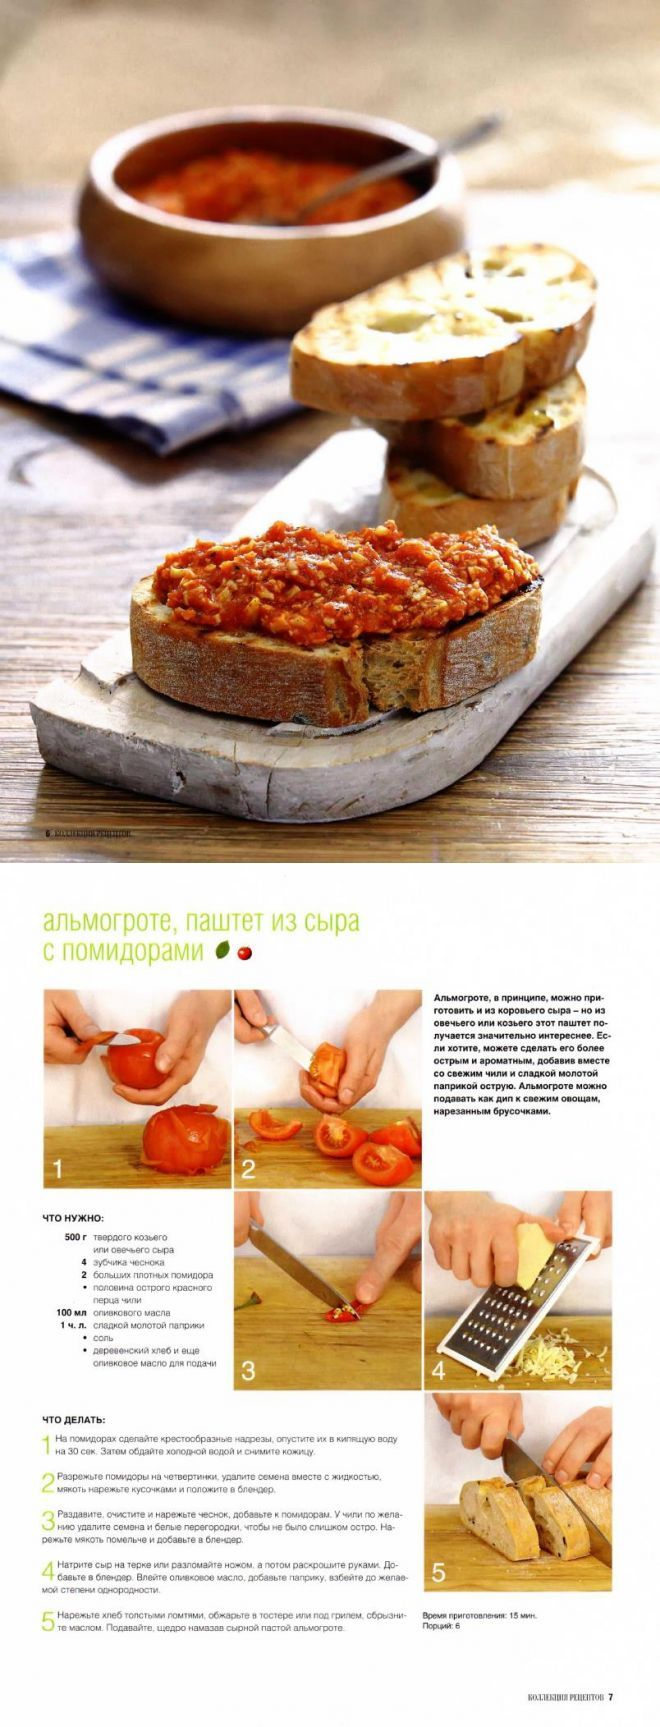 альмогроте.паштет из сыра с помидорами